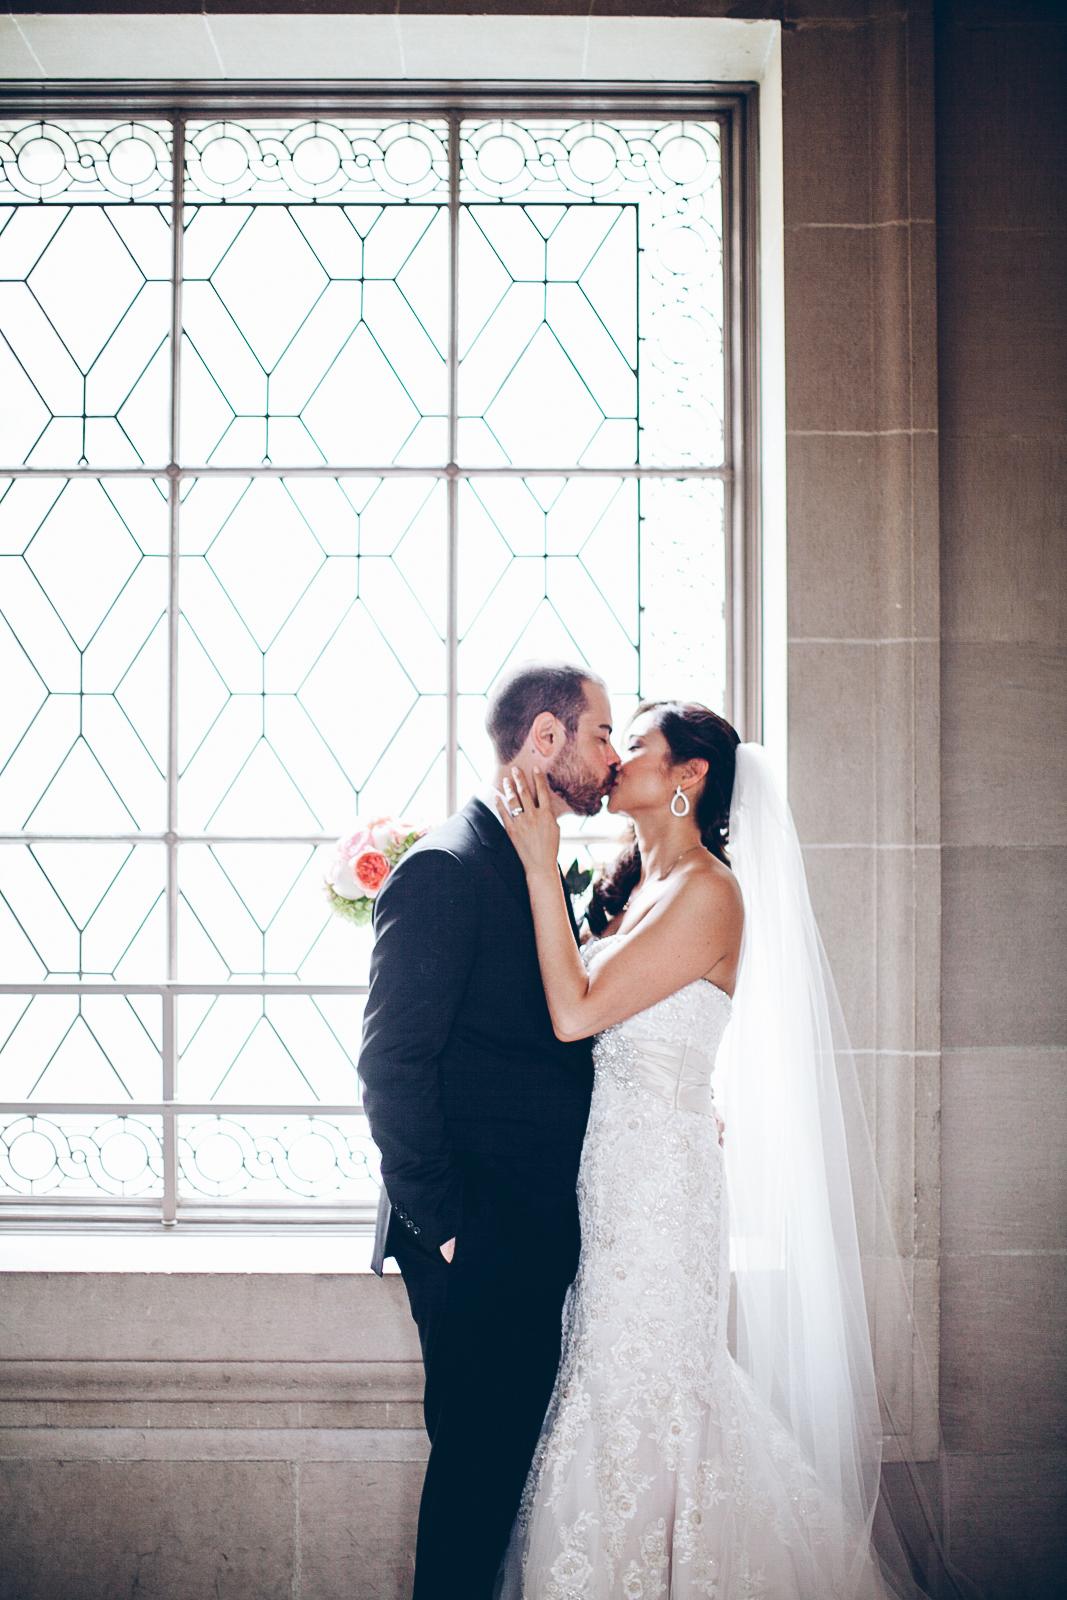 San_francisco_city_hall_wedding_photography_meegan_travis_ebony_siovhan_bokeh_photography_47.jpg